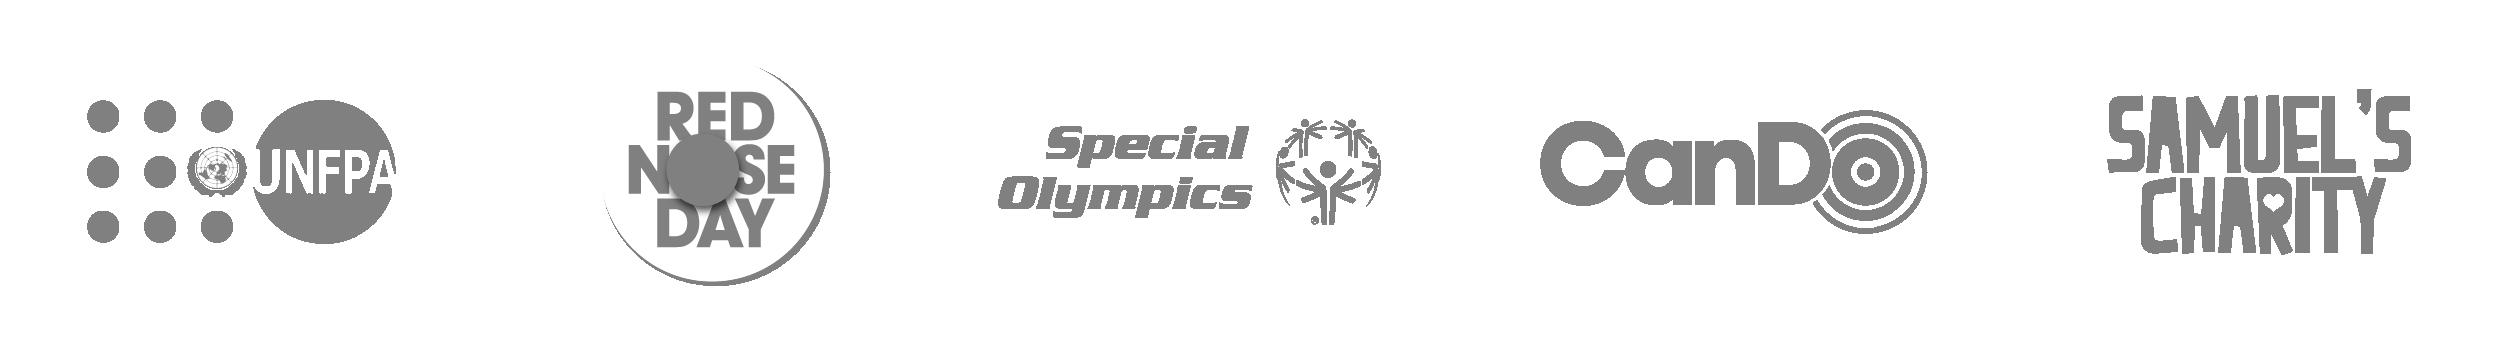 website-logo-row6-01-01-01.png